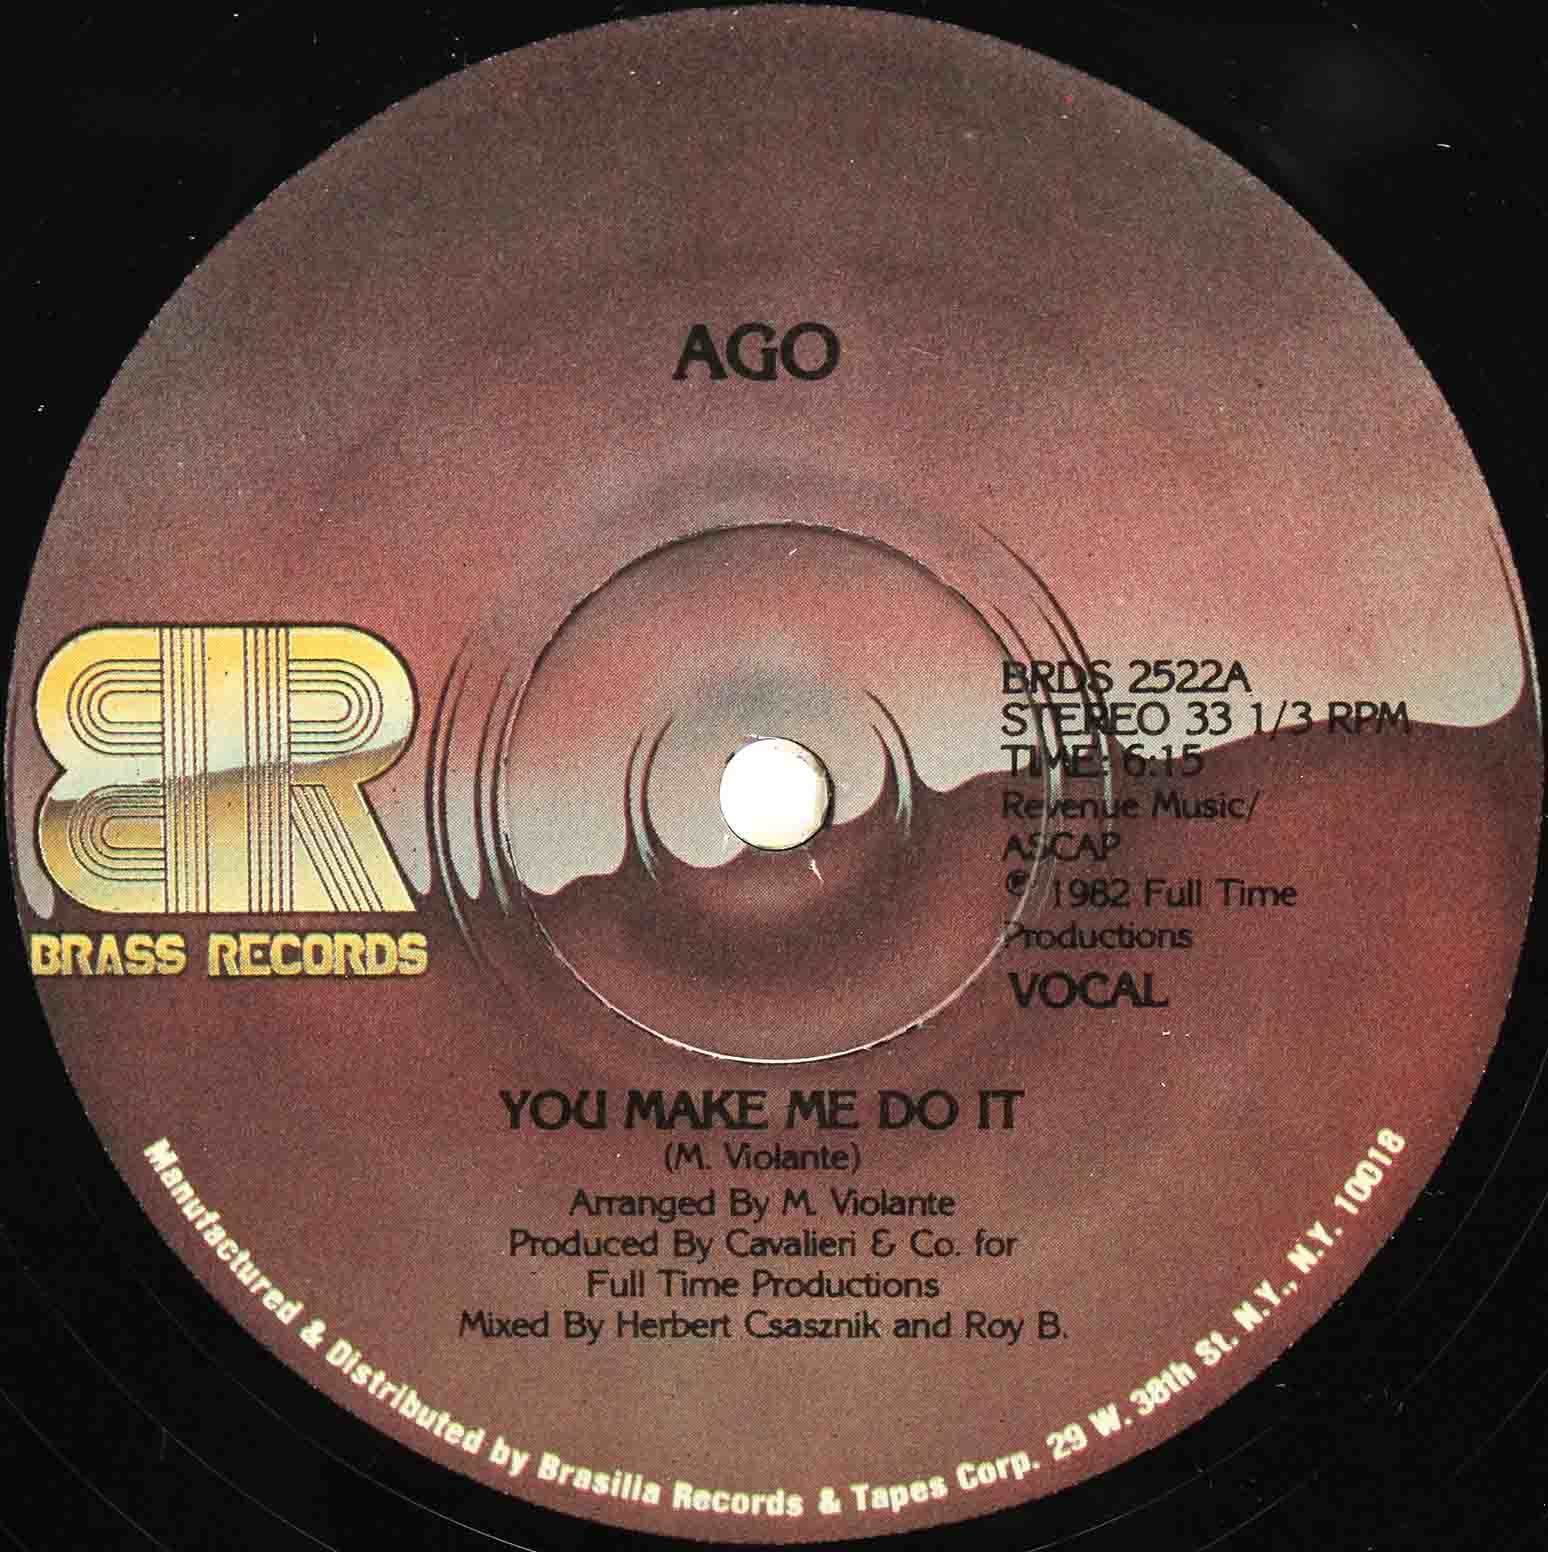 Ago - You Make Me Do It 03